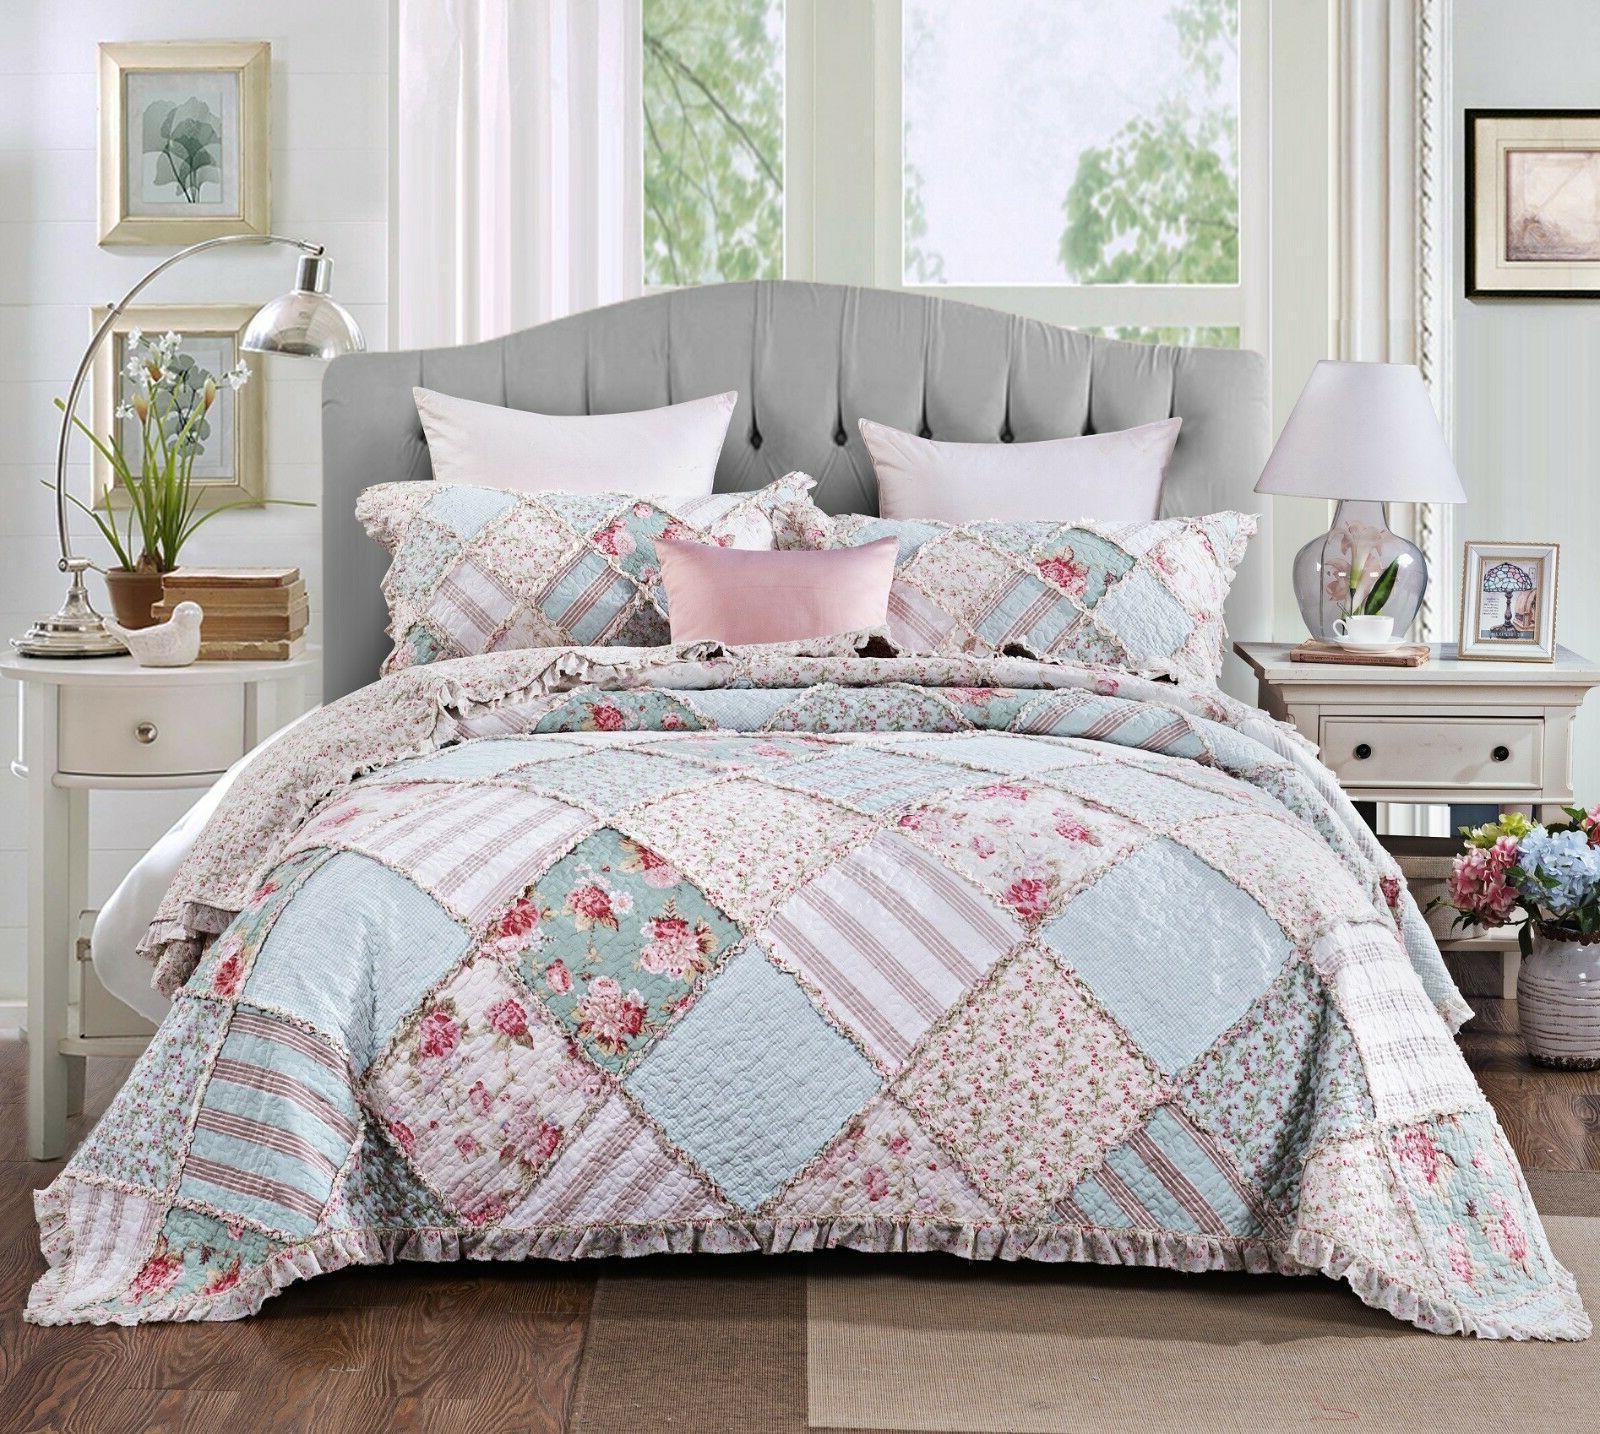 DaDa Mint Pastel Pink Ruffle Bedspread Set